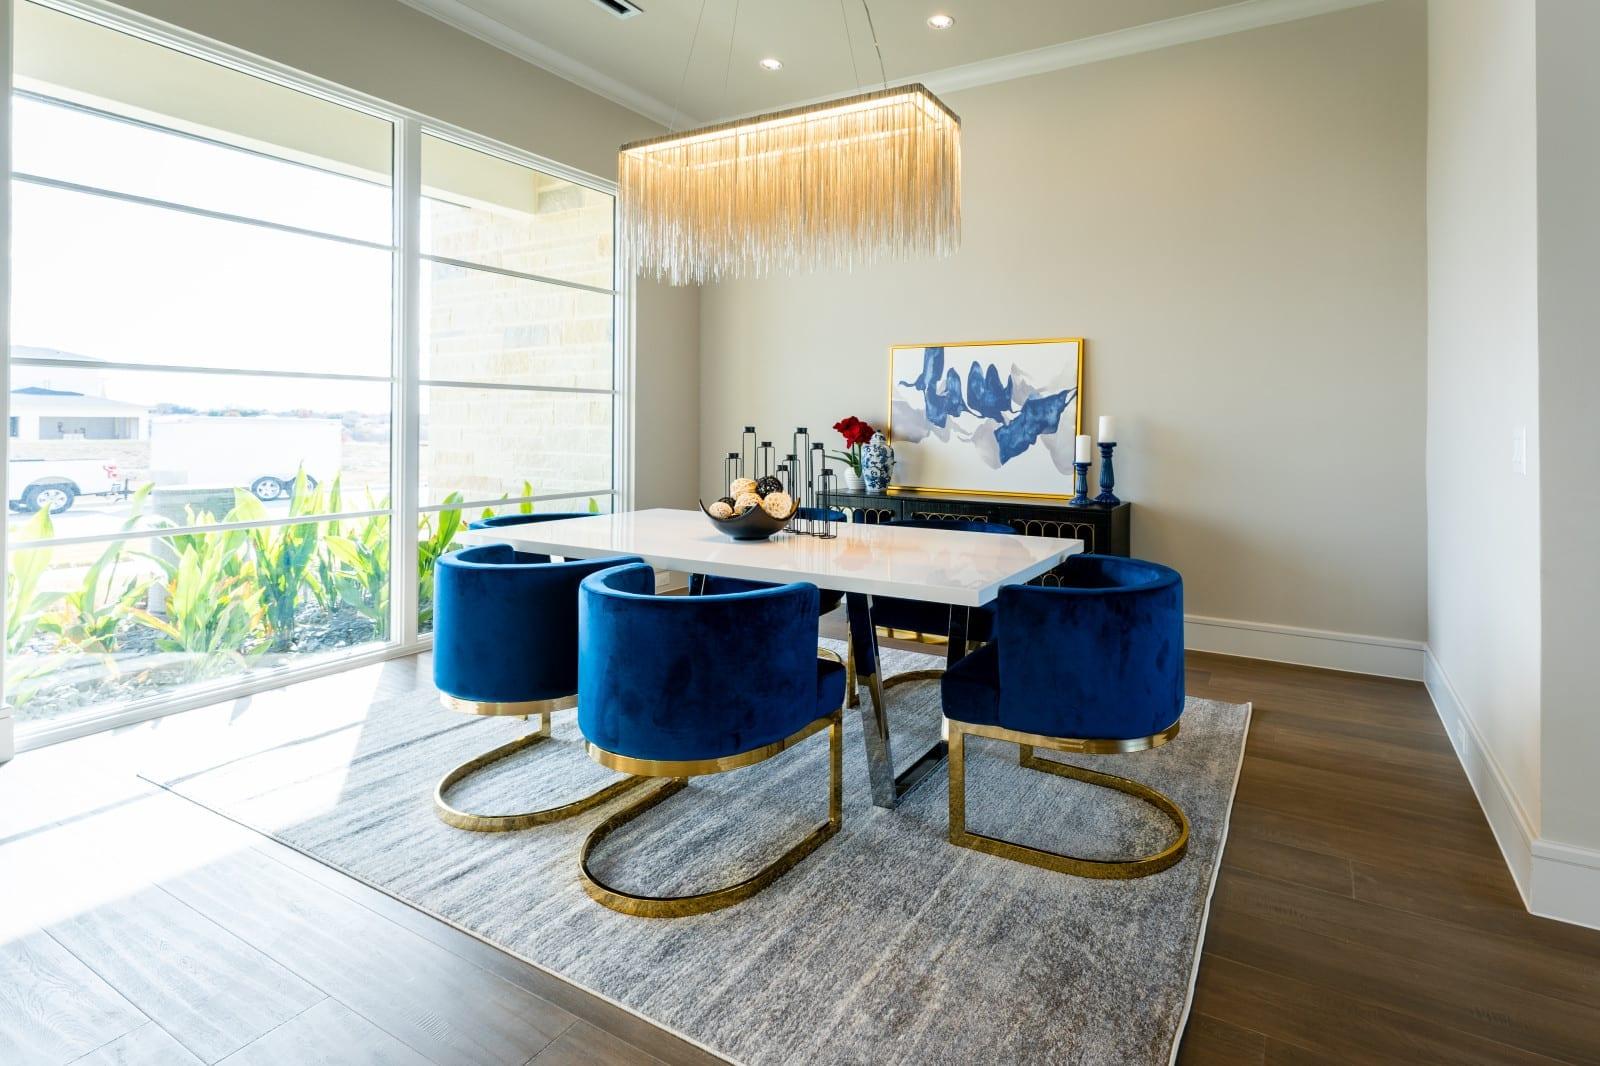 Modern Style Homes design # 6 - Millennial Design + Build